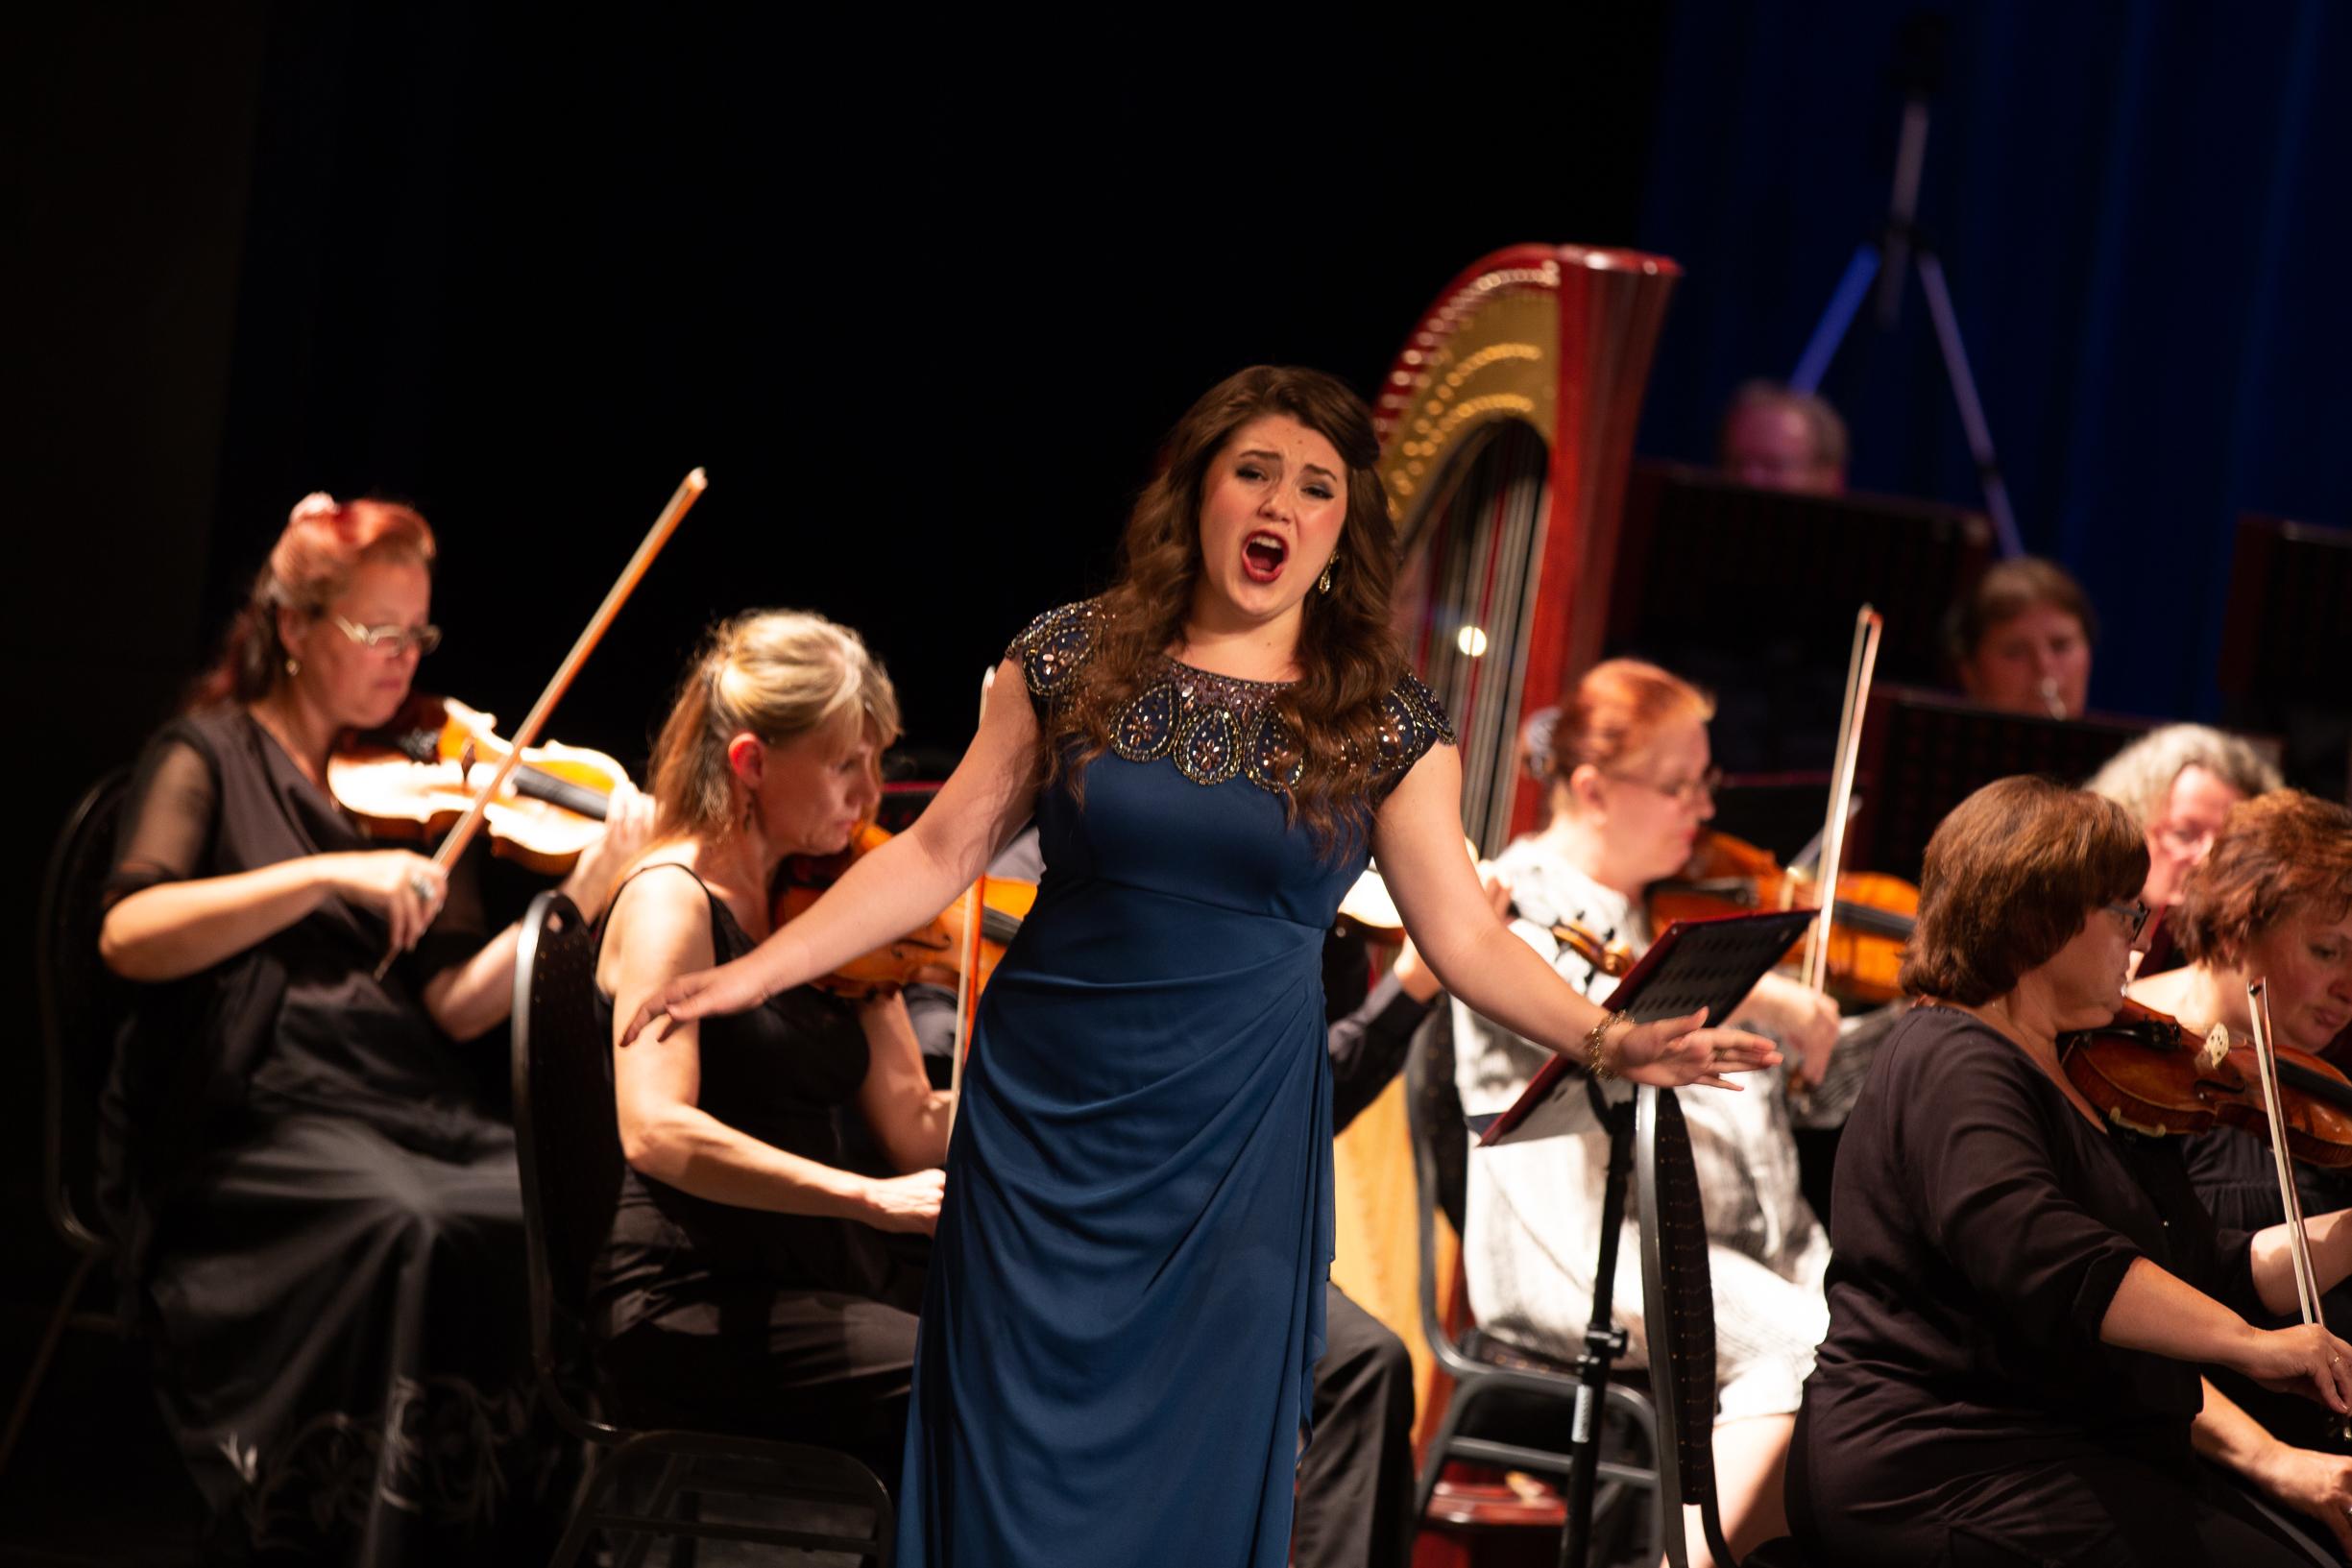 Allysa Packard, Opernfest Prague